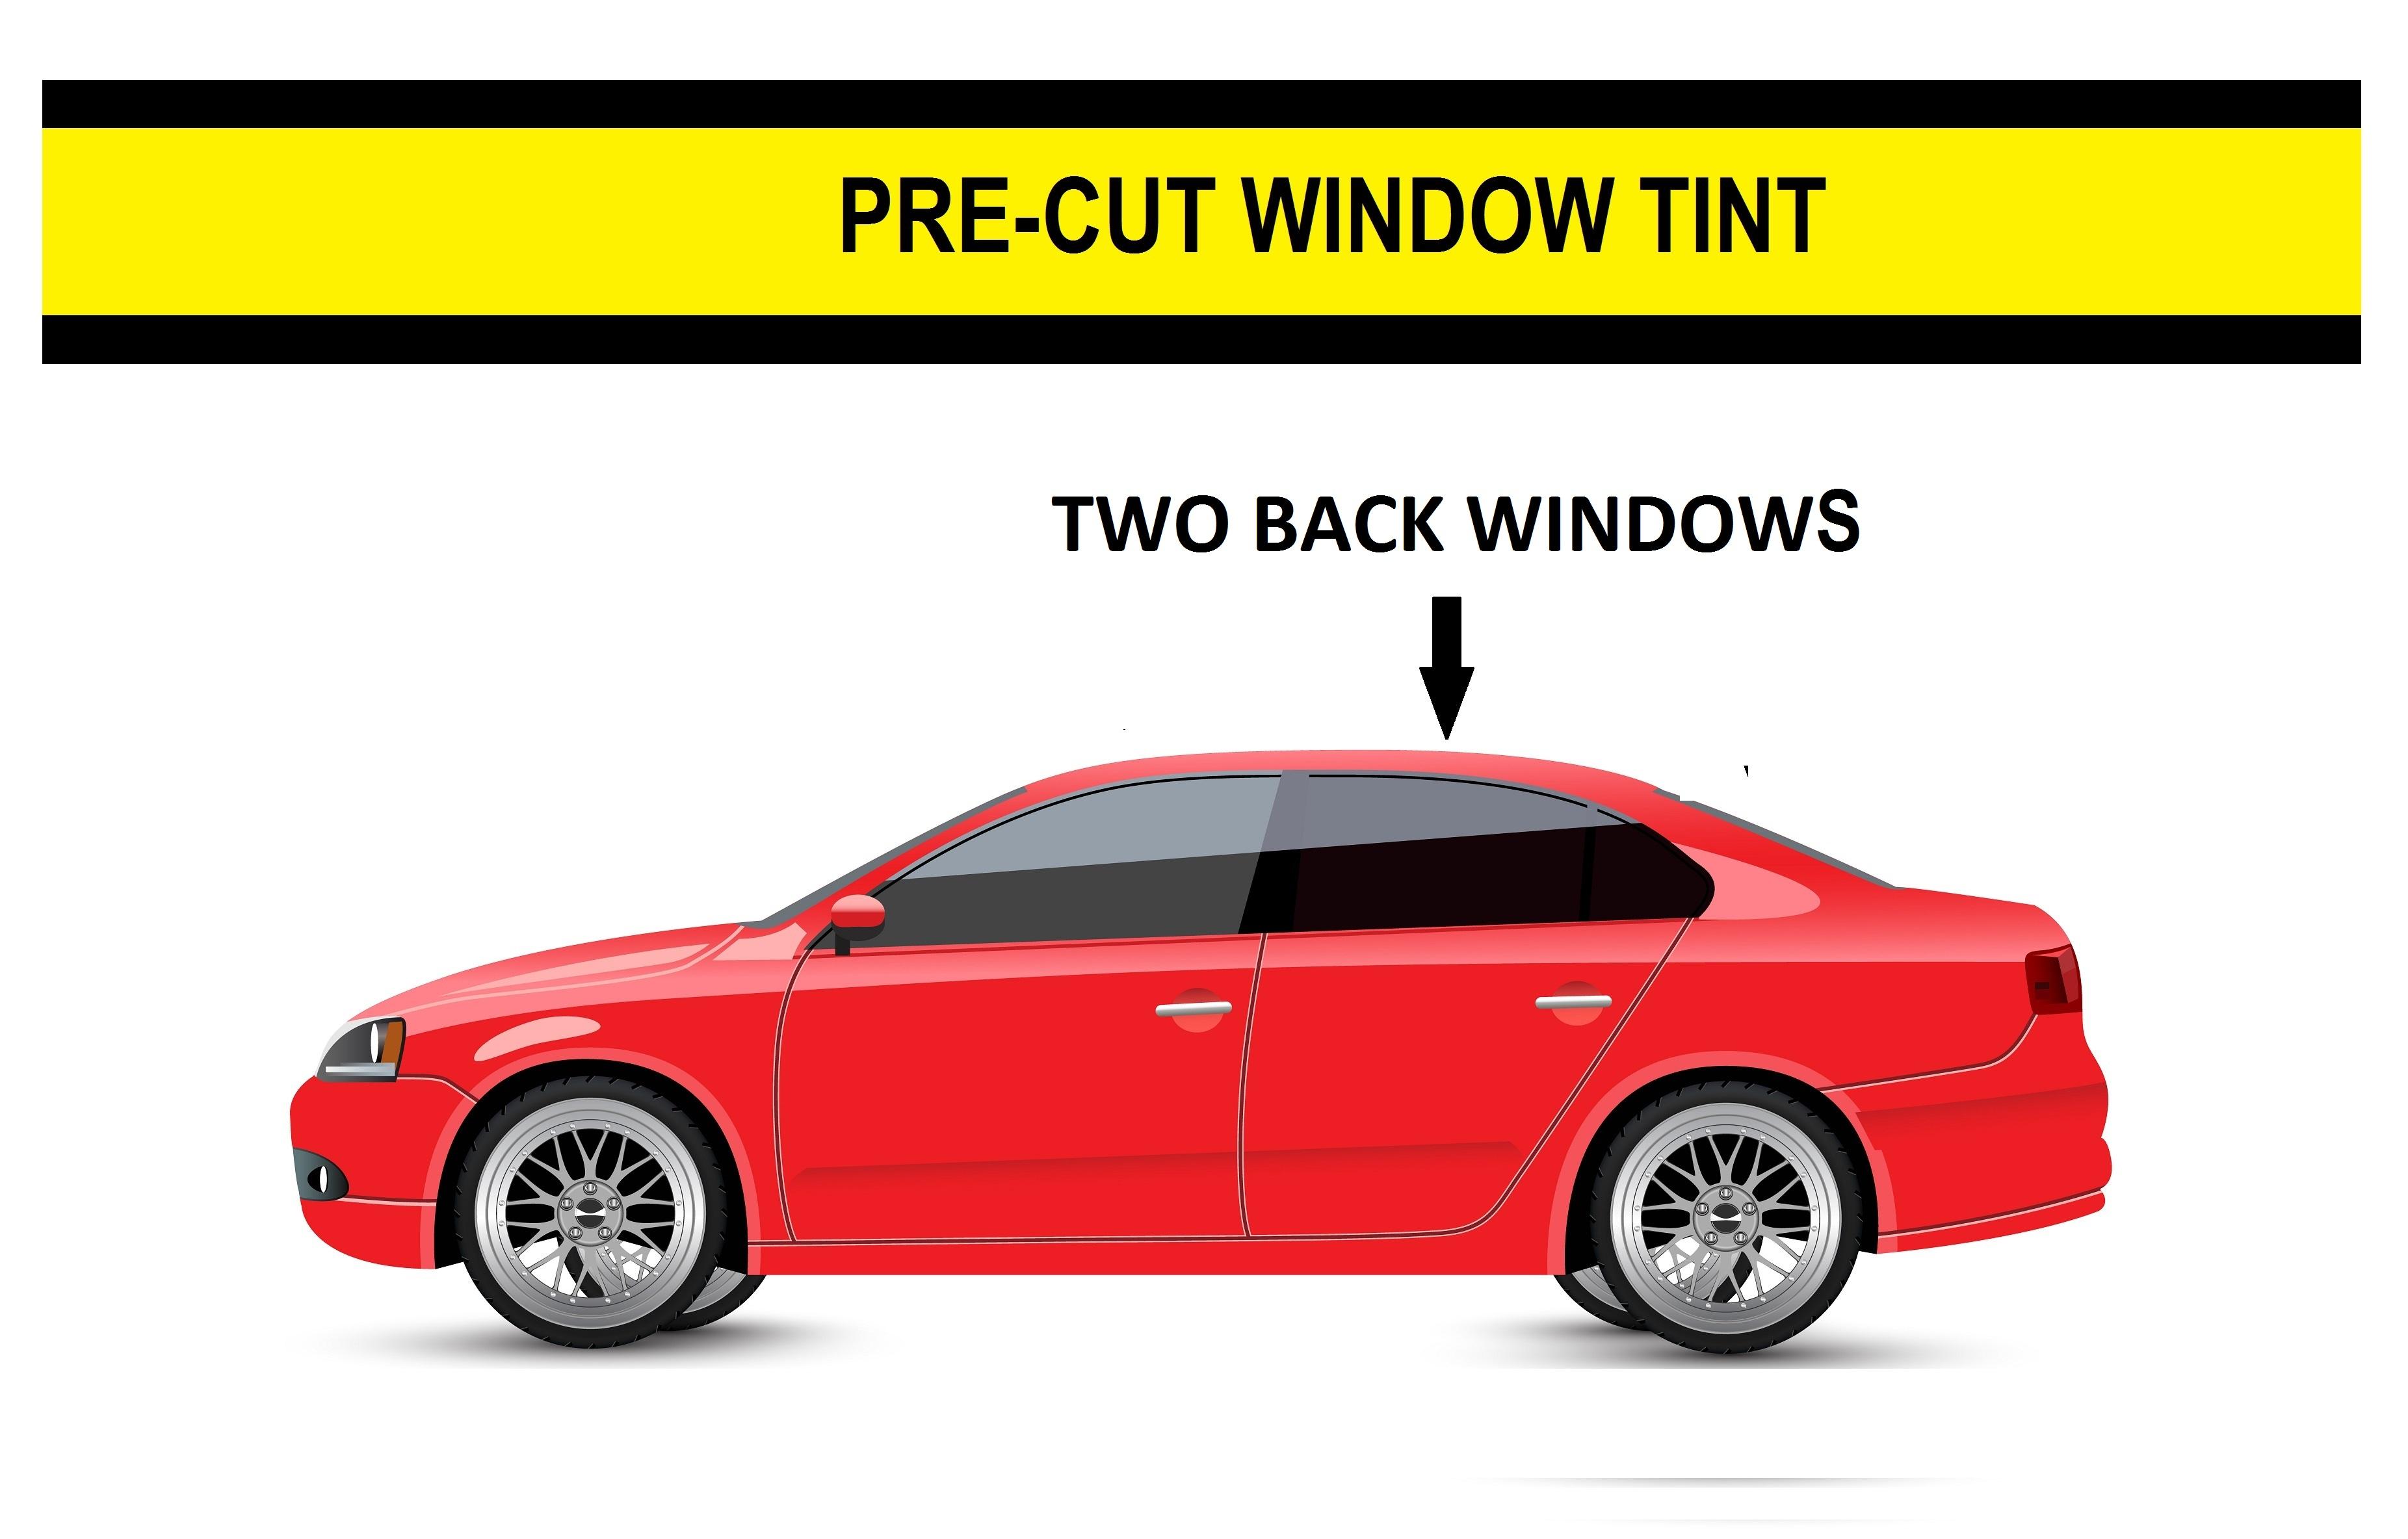 All Windows Any Shade Precut Window Tint for Mercedes ML320 98-02